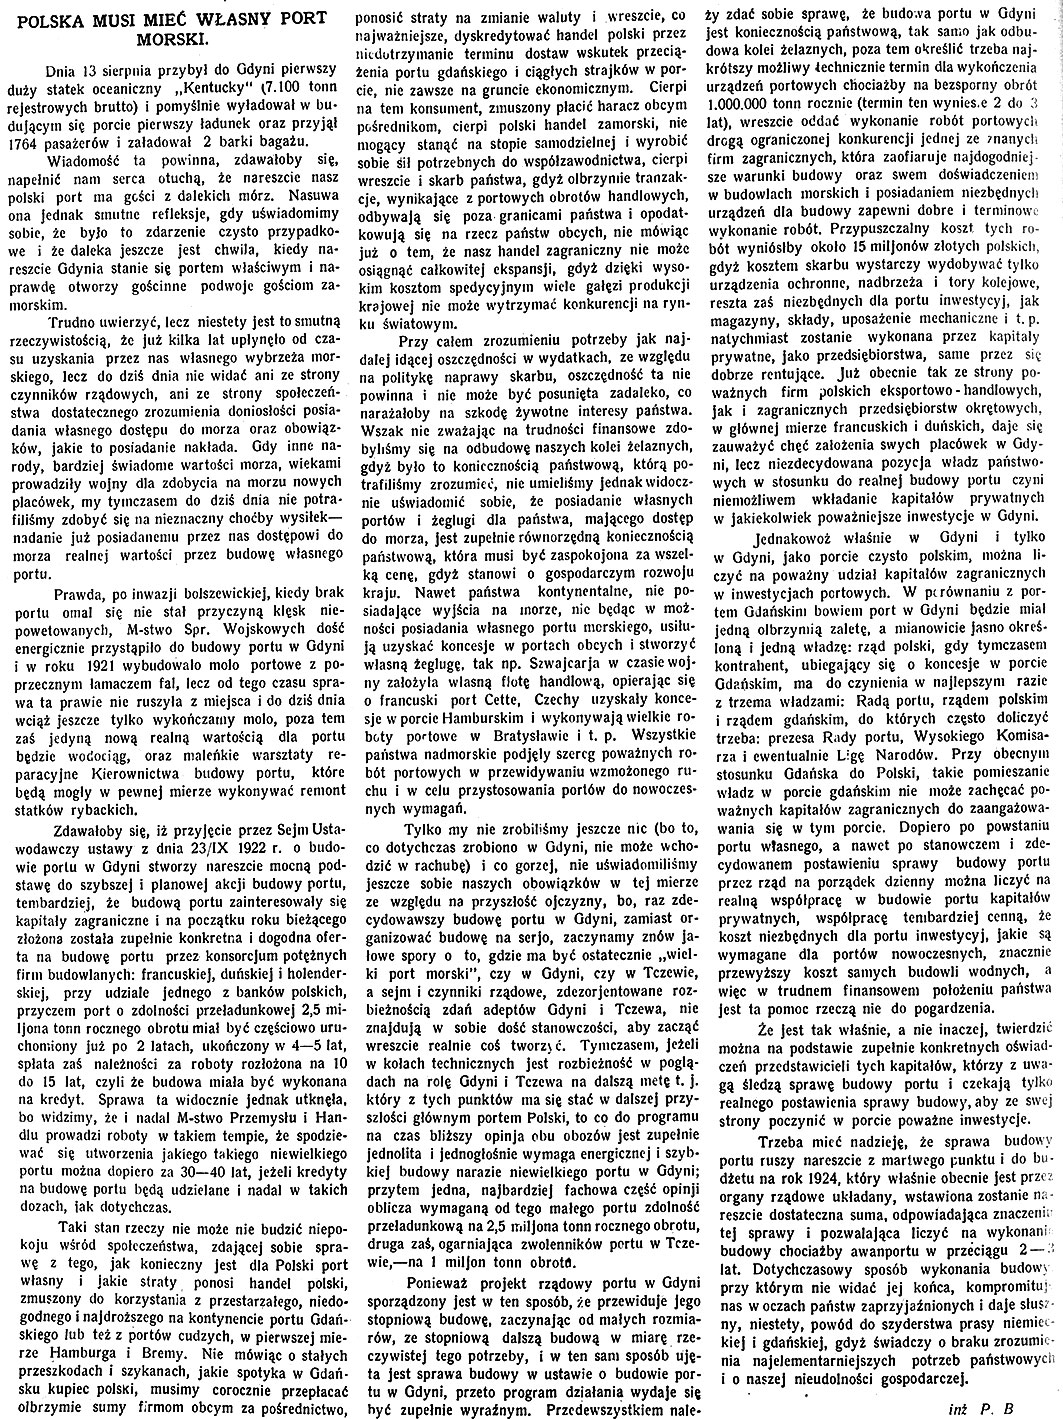 Polska musi mieć własny port morski / P.B. // Tygodnik Ilustrowany. - 1923, nr 37, s. 592